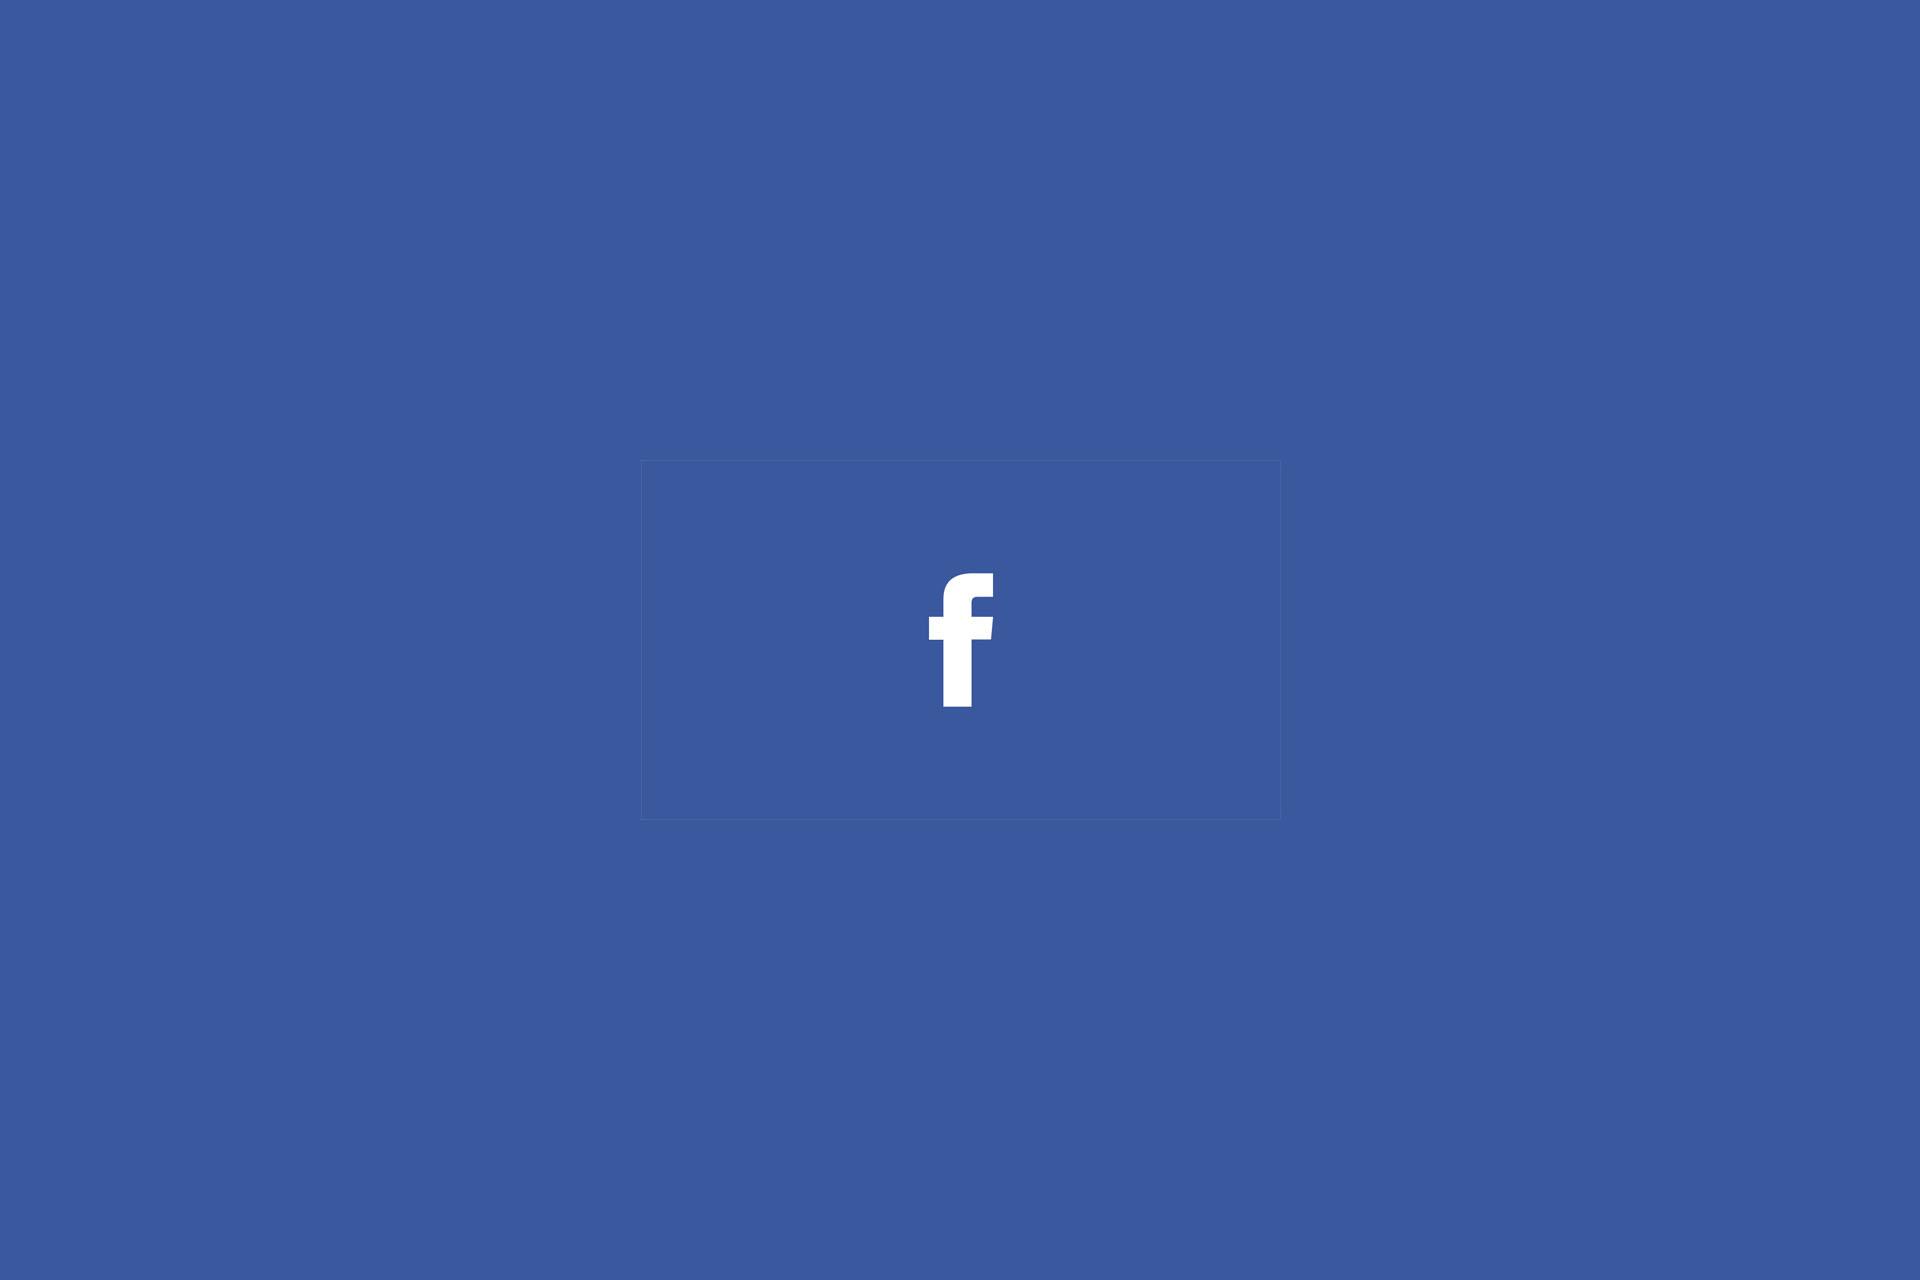 Llega el PRE-ROLL a Facebook